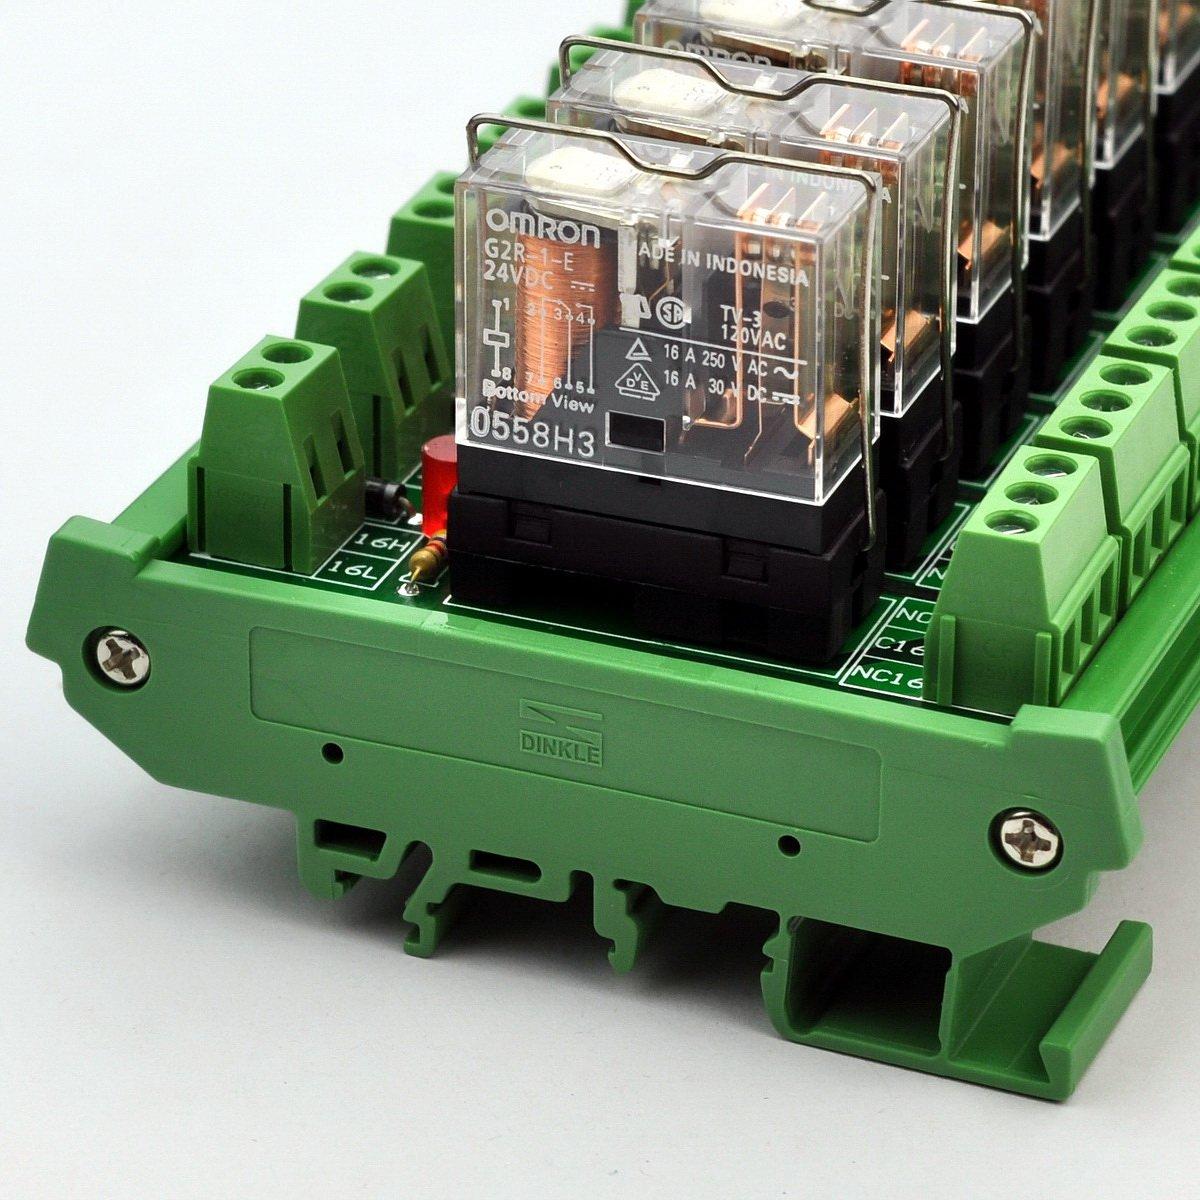 ELECTRONICS-SALON DIN Rail Mount 2 SPDT 16A Power Relay Interface Module,G2R-1-E DC24V Relay